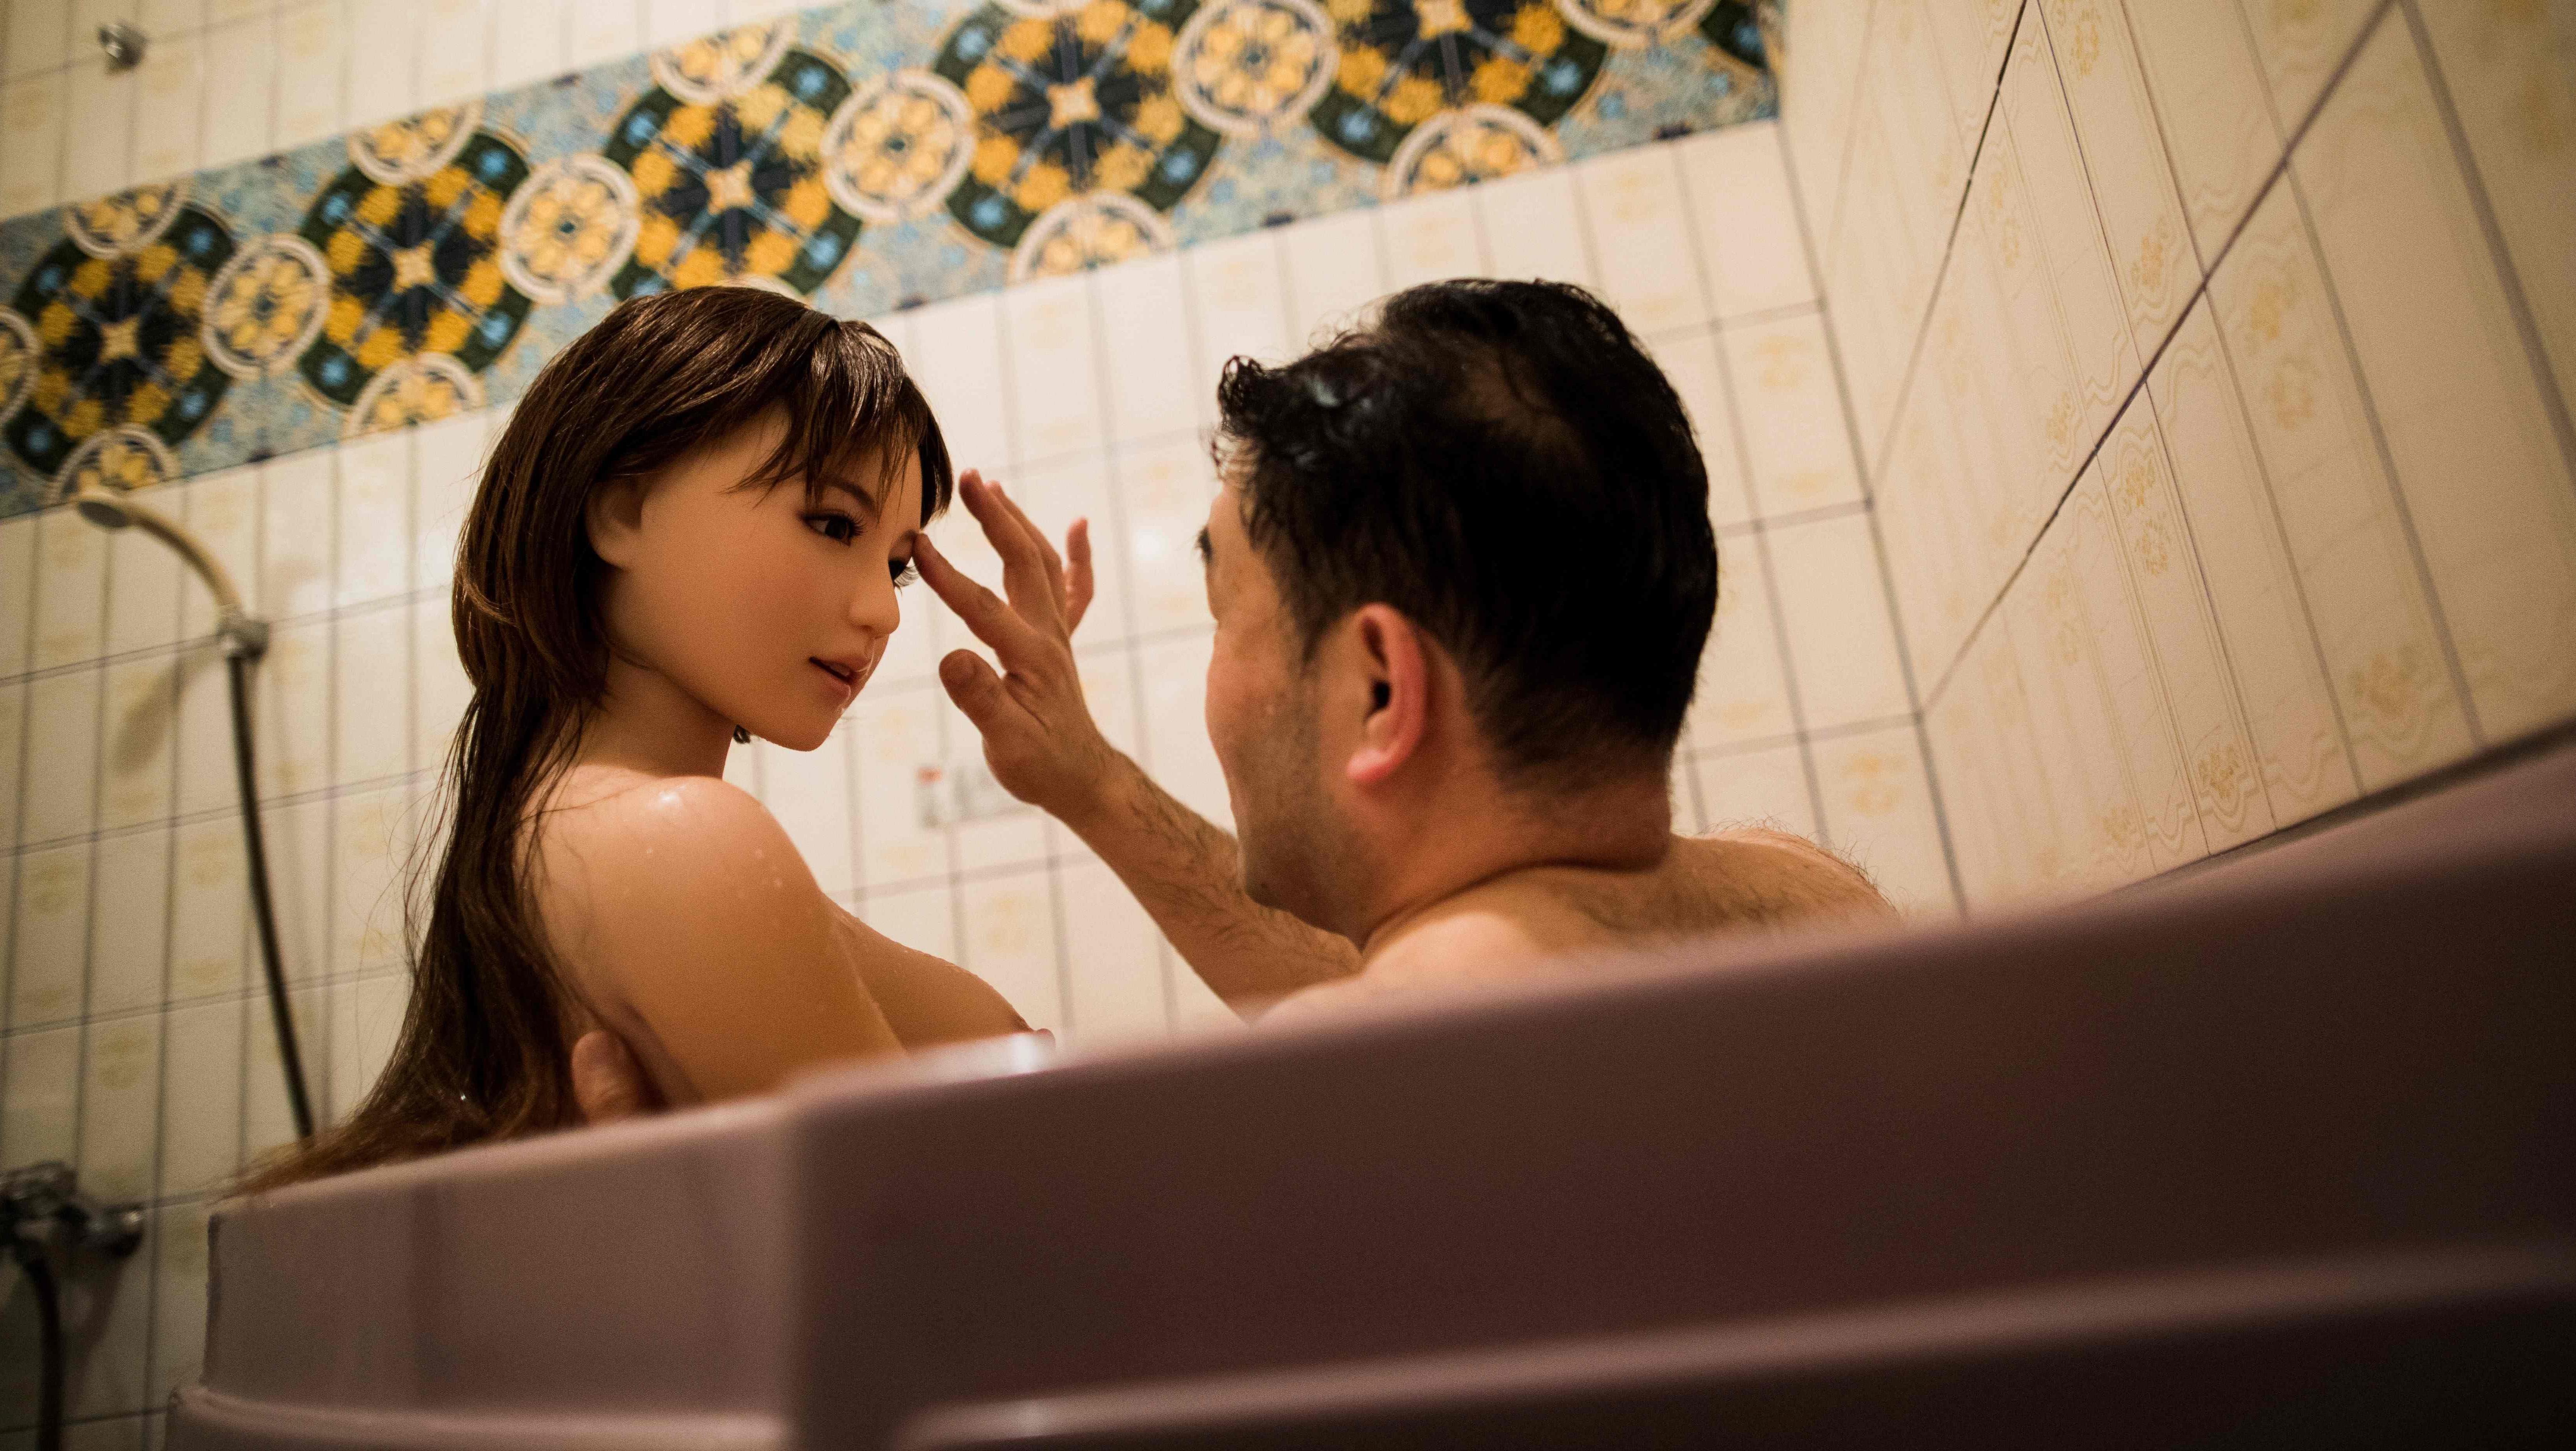 japońska żona uwielbia seks seks lesbijski sen sex fotki